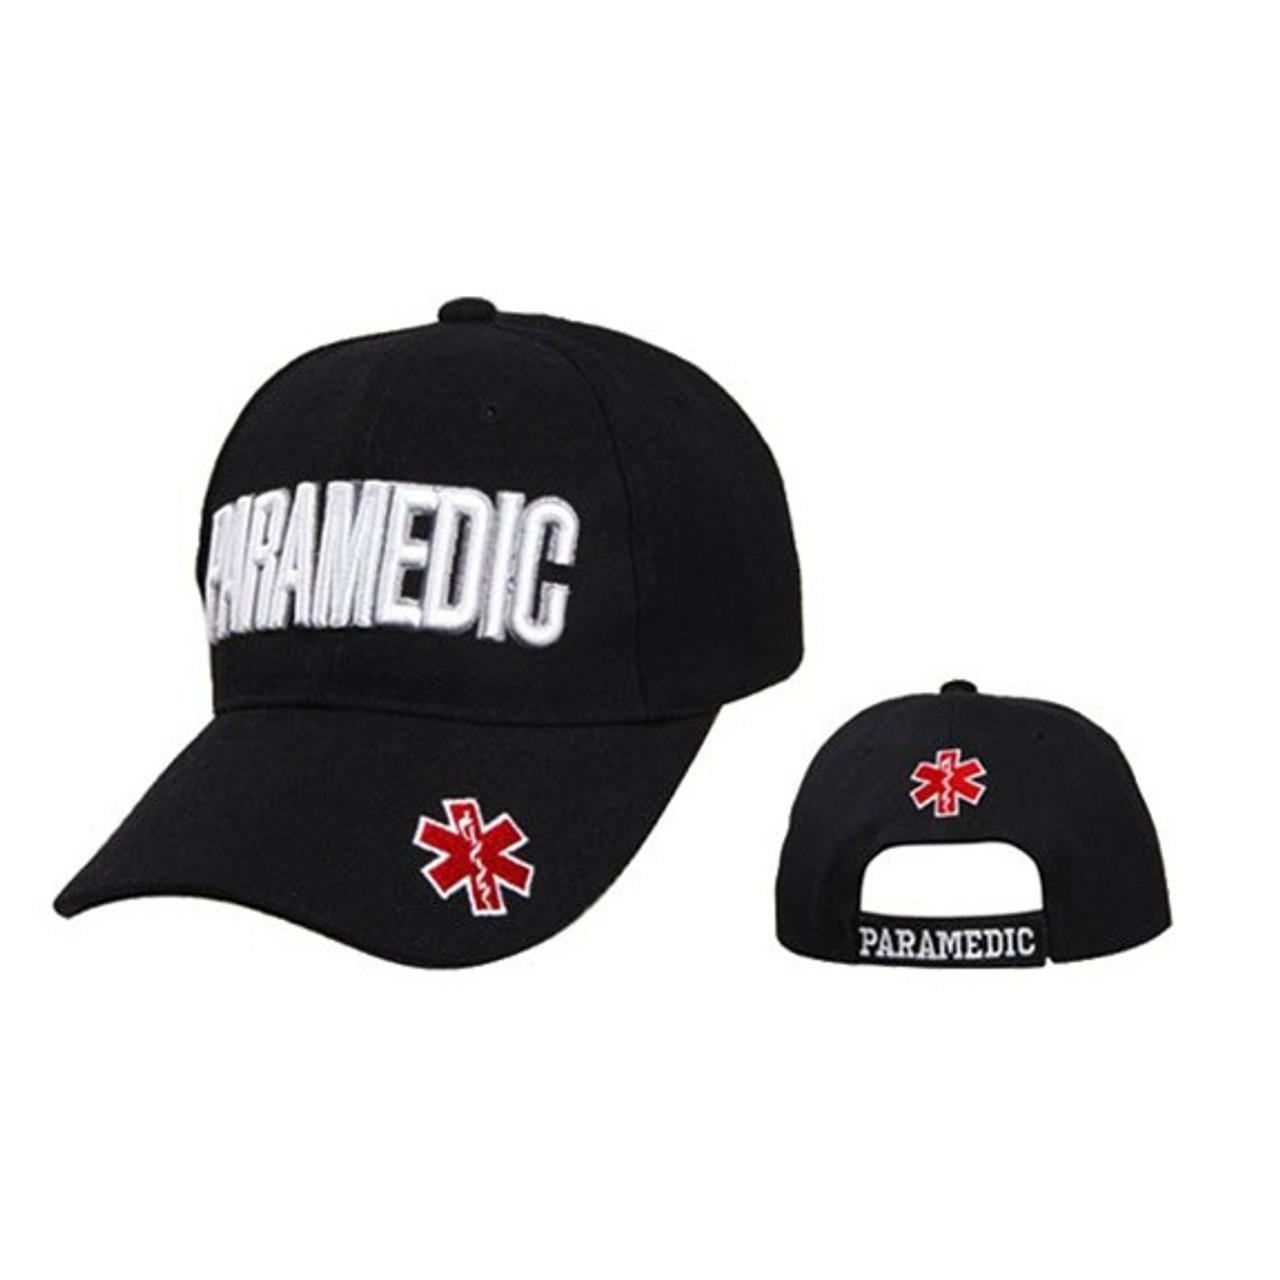 Paramedic Baseball Cap with Star of Life Symbol C1002